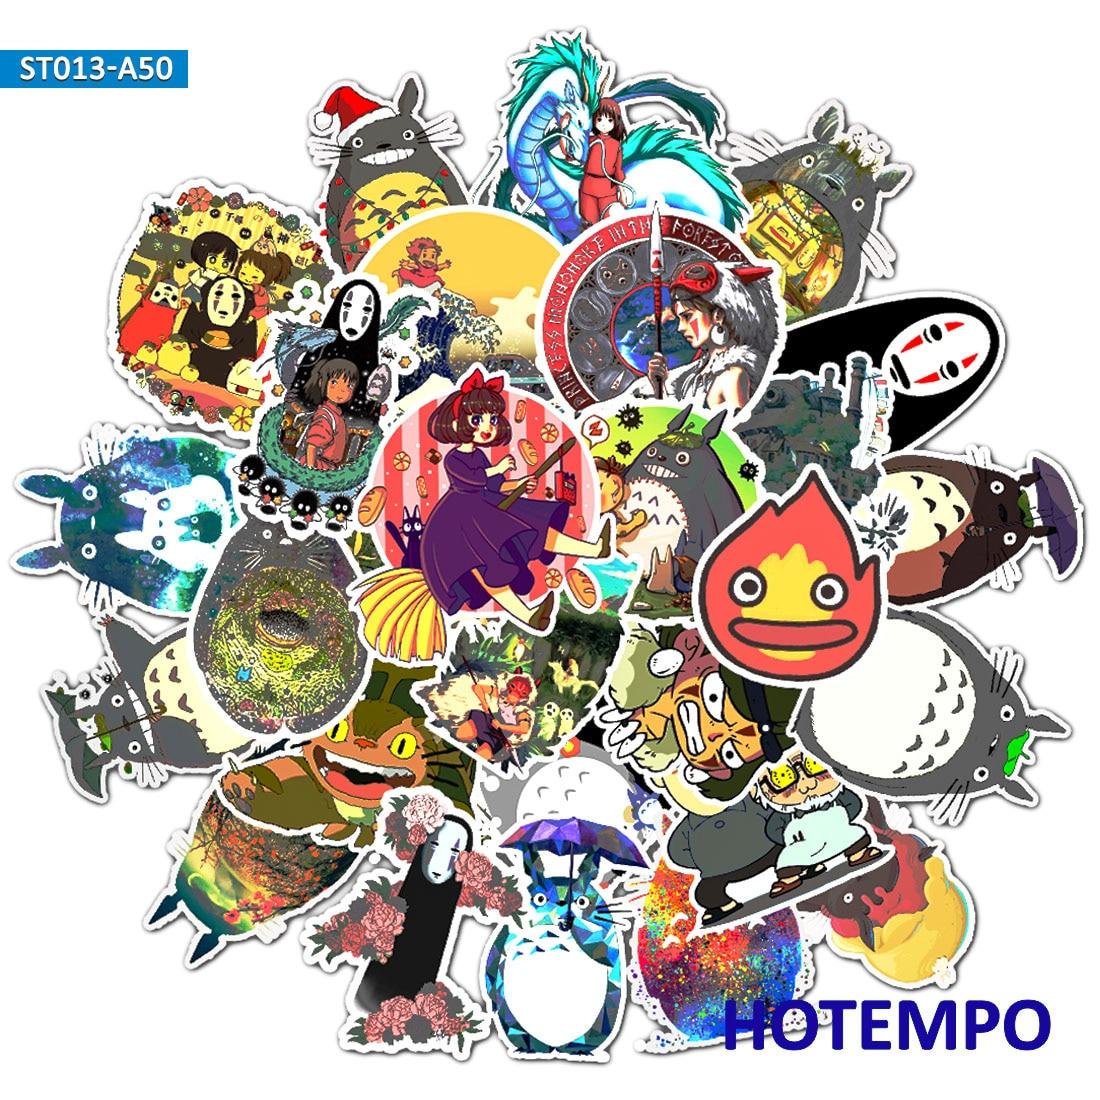 50pcs Japan Comics Miyazaki Hayao Cartoon Stickers For Mobile Phone Laptop Luggage Suitcase Guitar Skateboard Decal Stickers